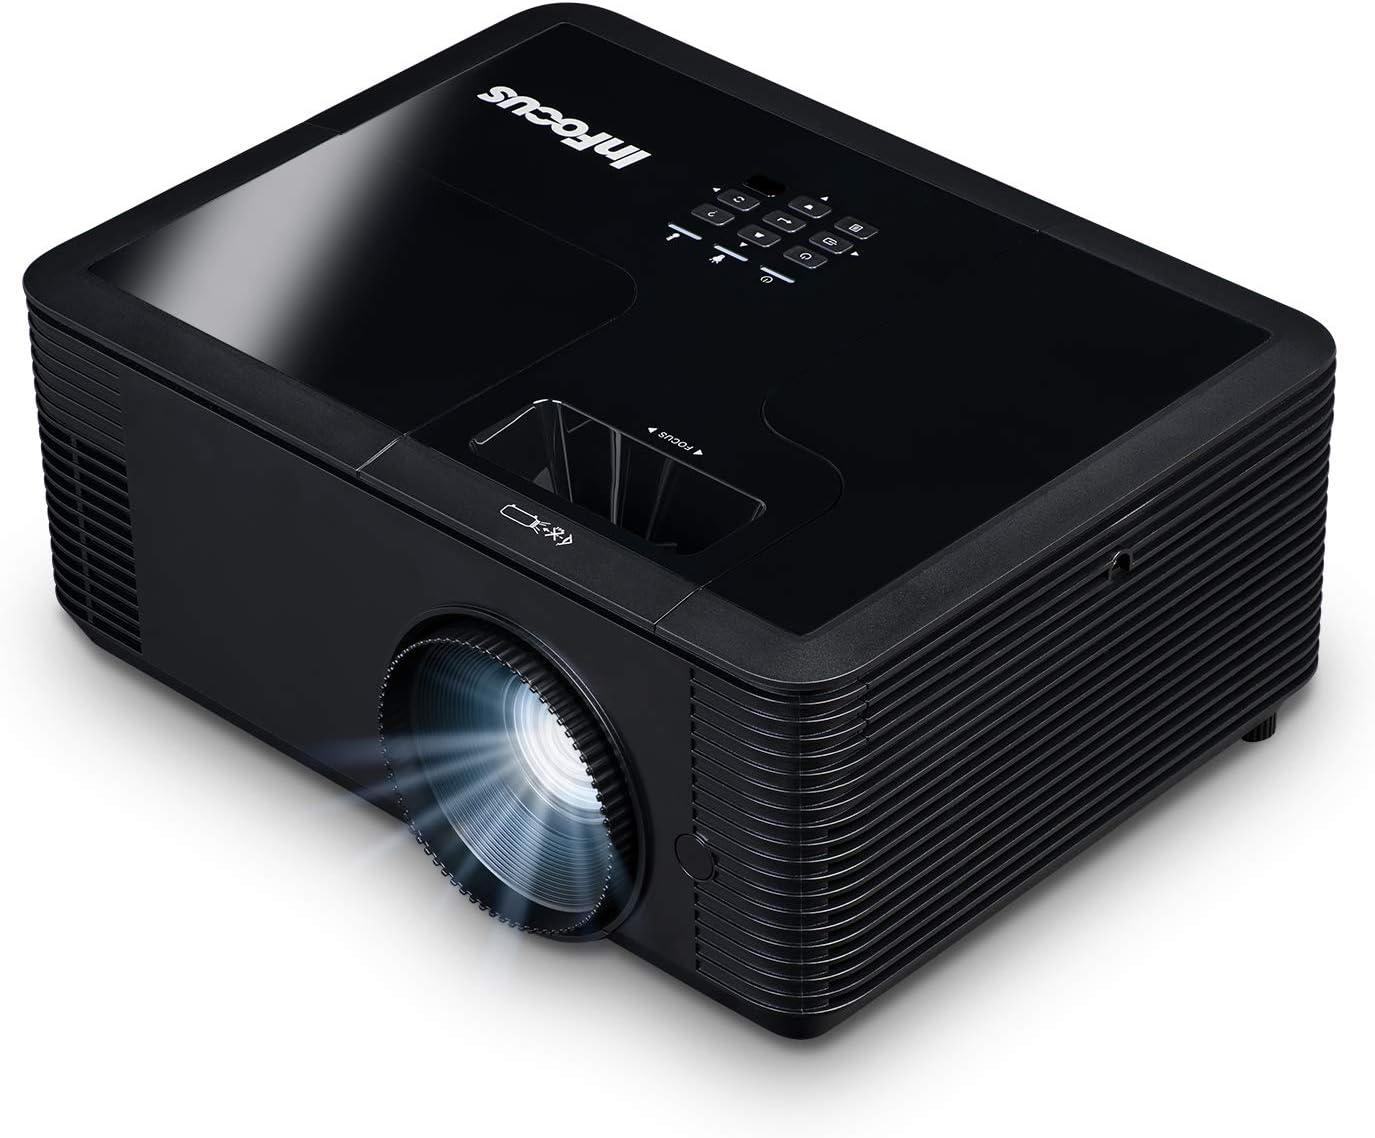 InFocus IN136 DLP WXGA 4000 Lumens, 3X HDMI, VGA, 3D and Wi-Fi Ready TechStation Projector